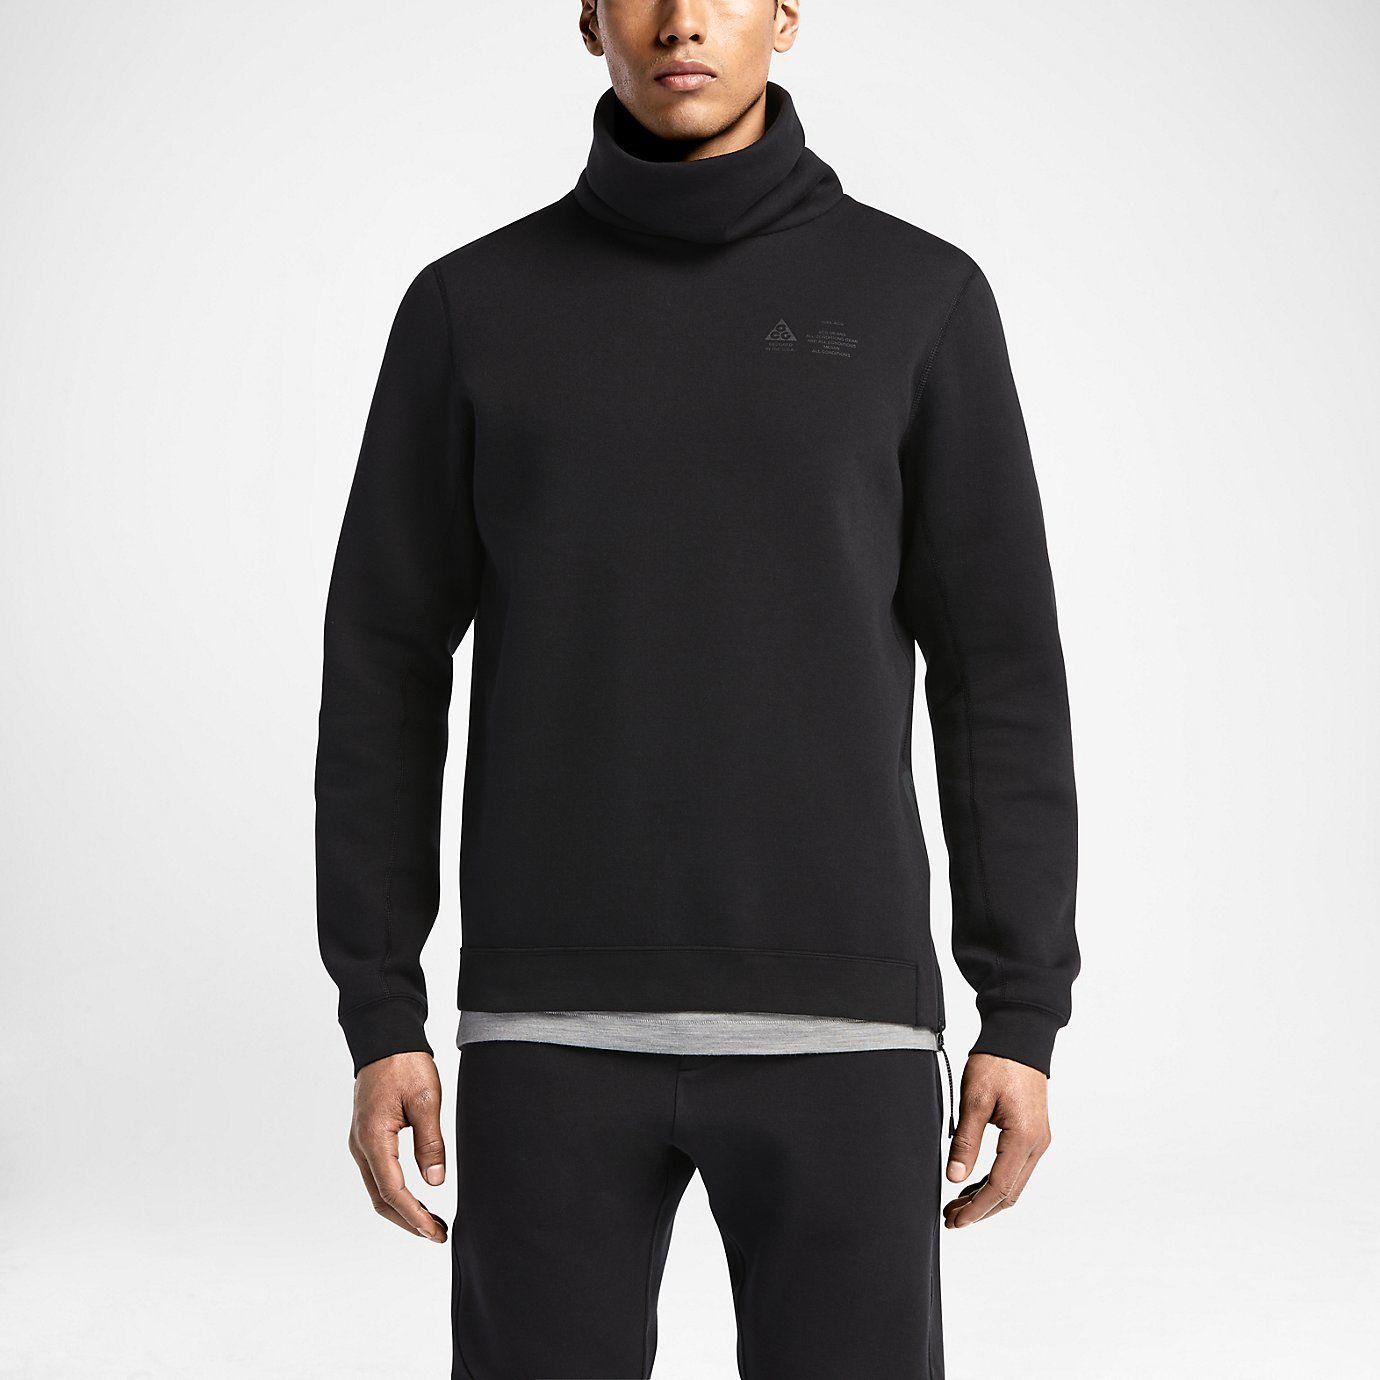 db11c530b NikeLab ACG Tech Fleece Funnel Pullover Men's Sweatshirt. Nike Store ...